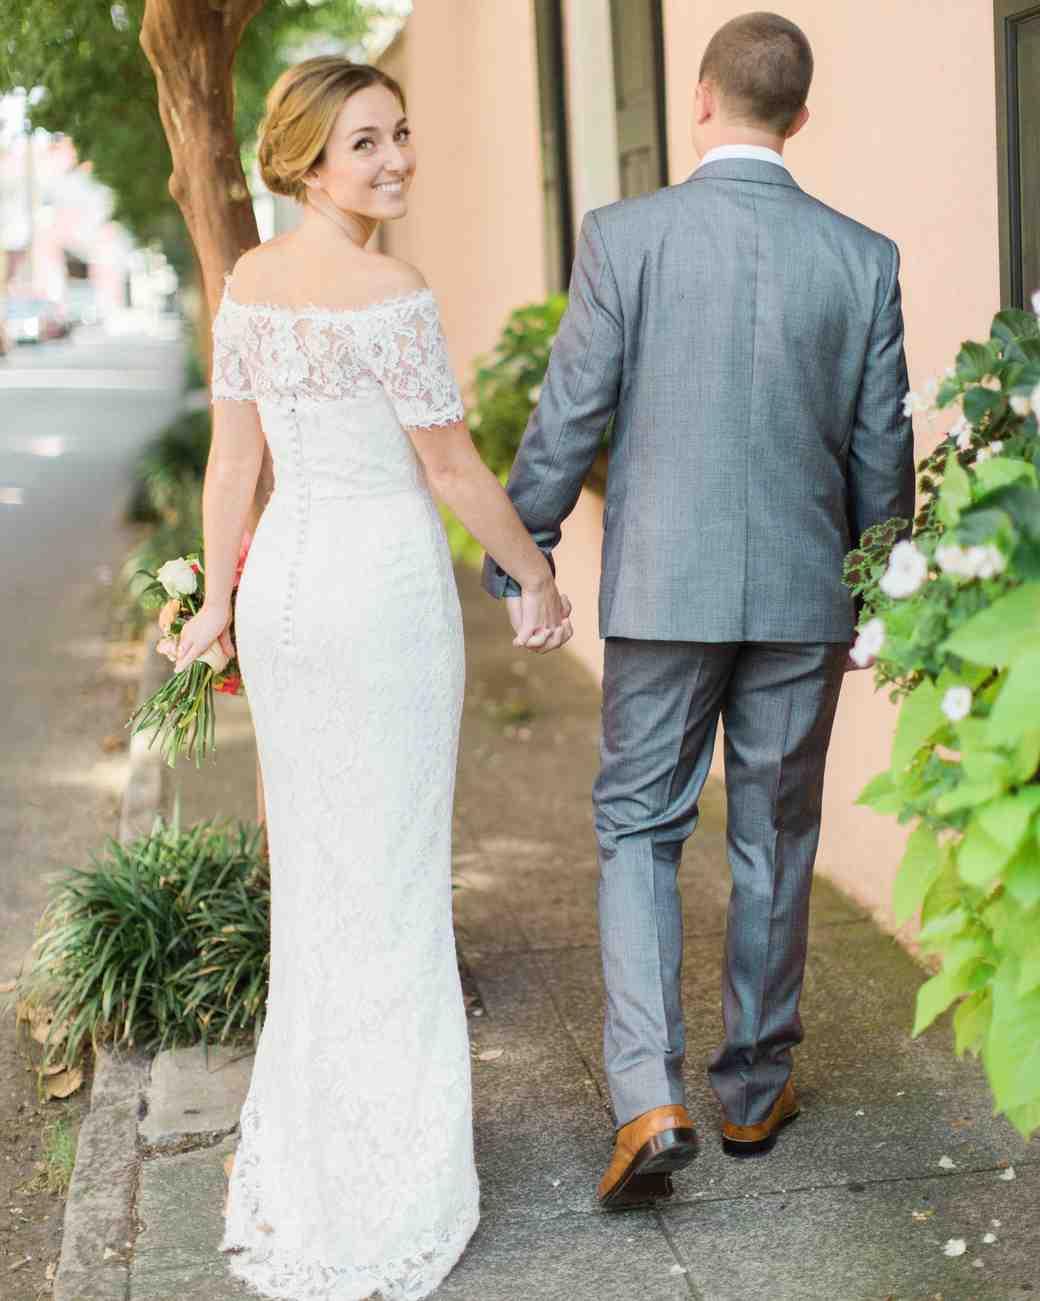 off the shoulder wedding dresses rachel red photography